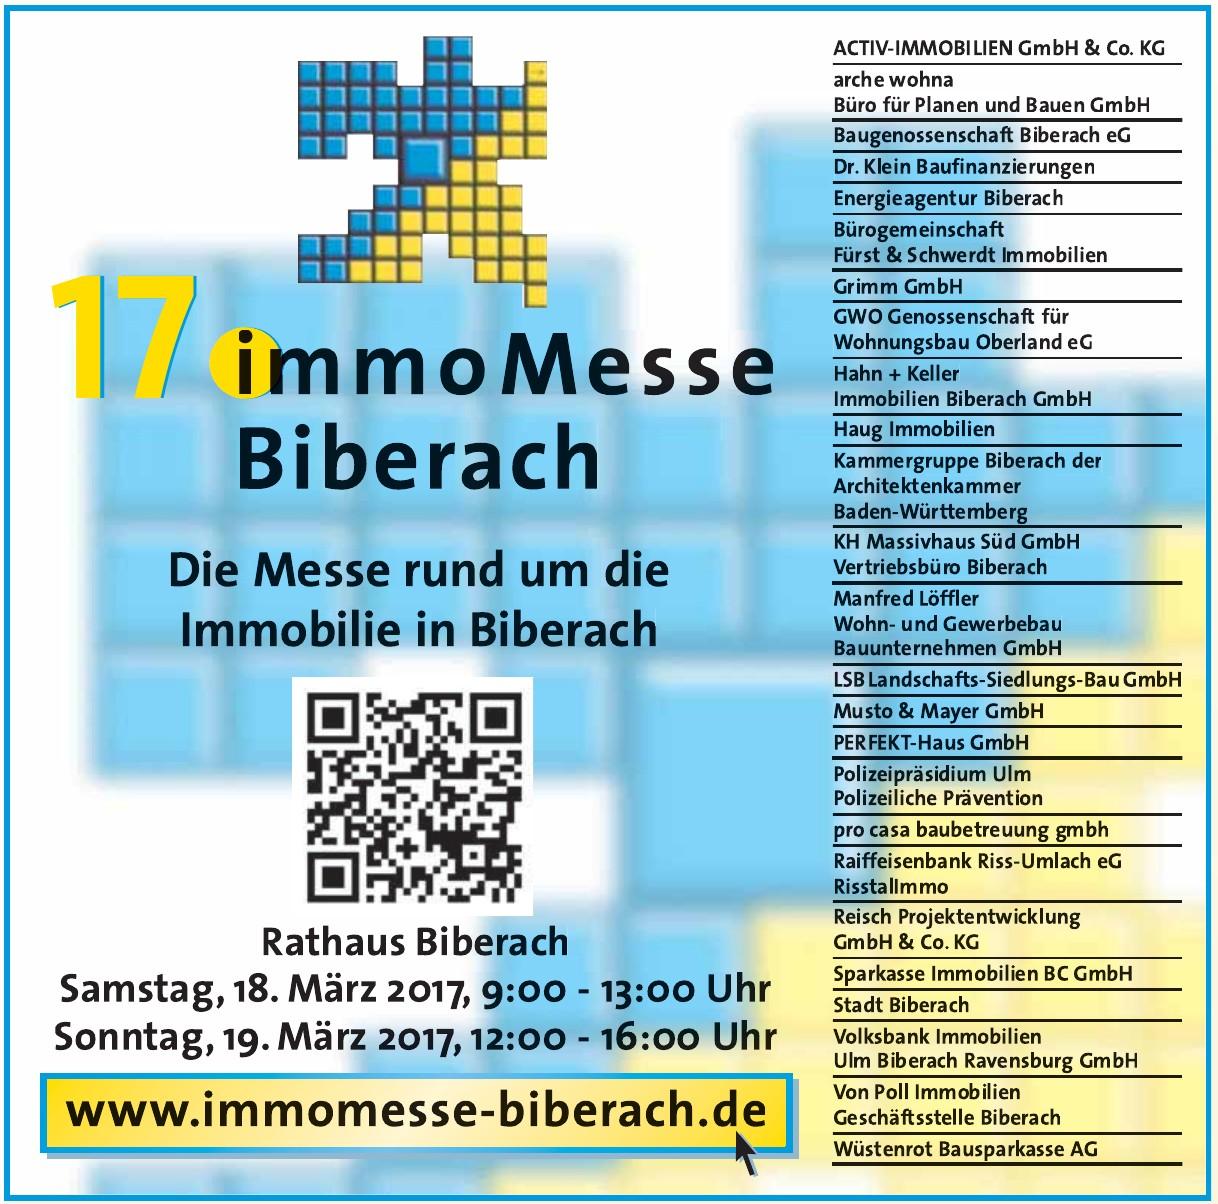 17 ImmoMesse Biberach